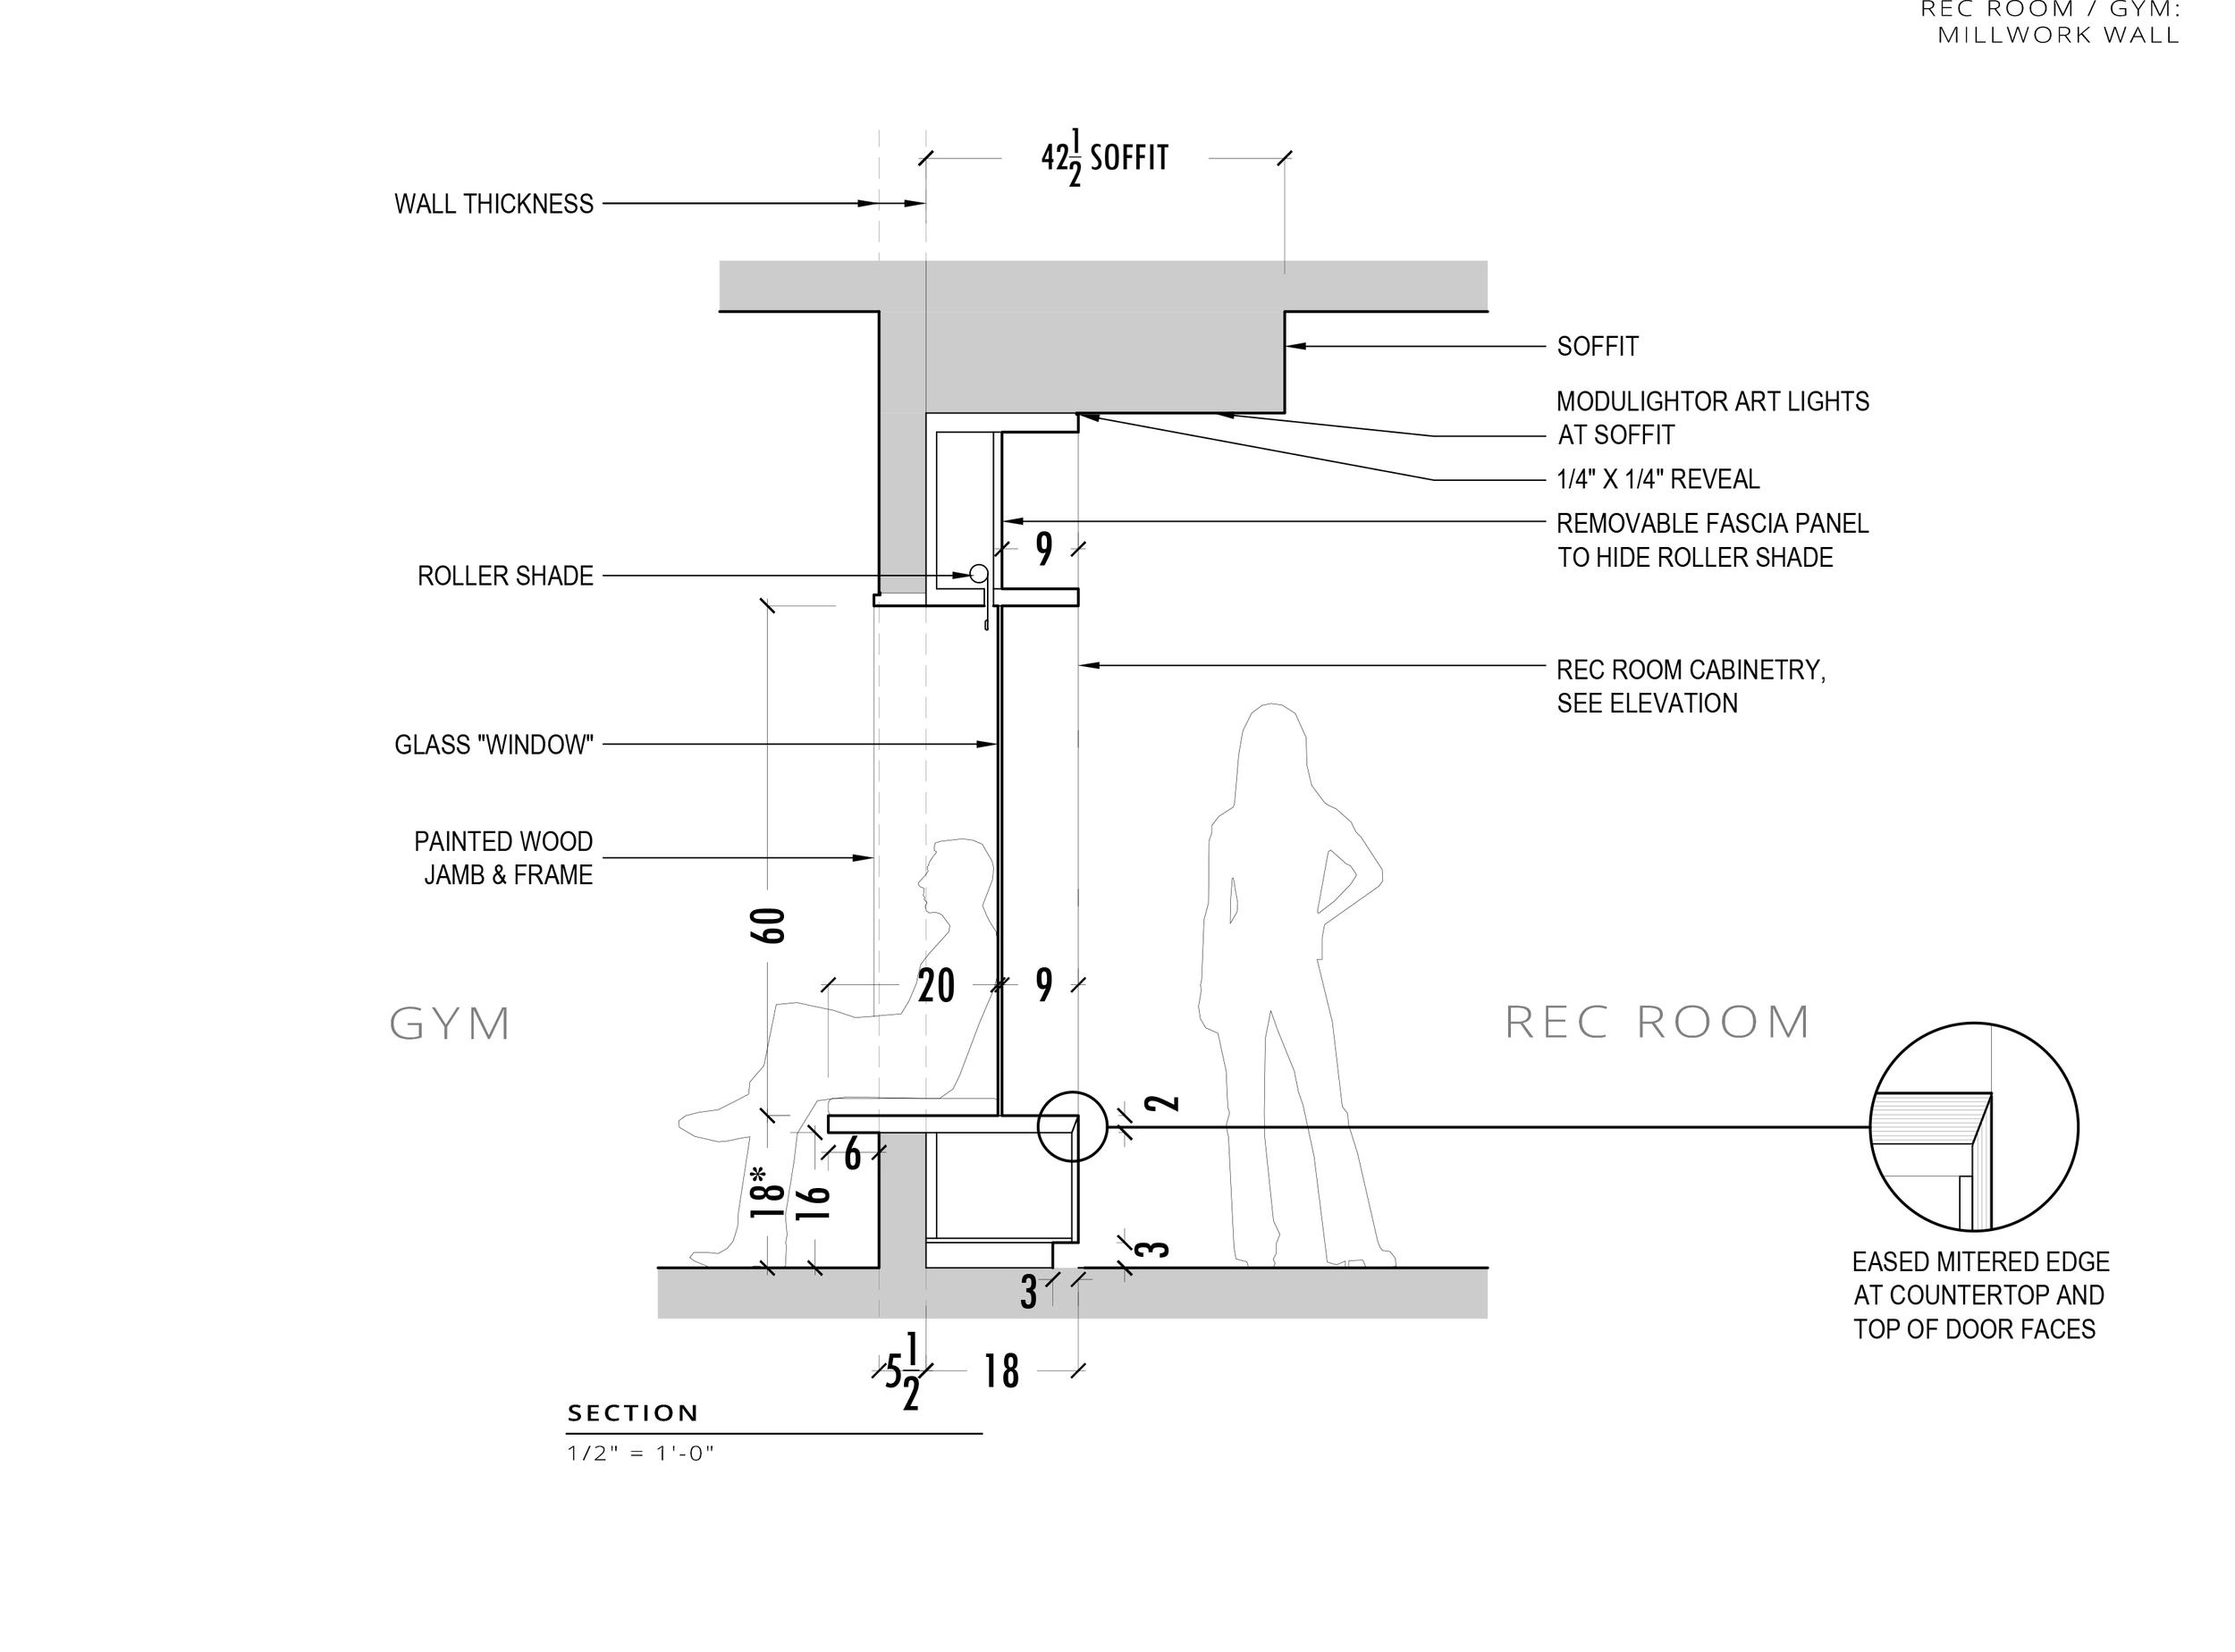 HSF Rec Room Millwork 2015-04-13 5.jpg